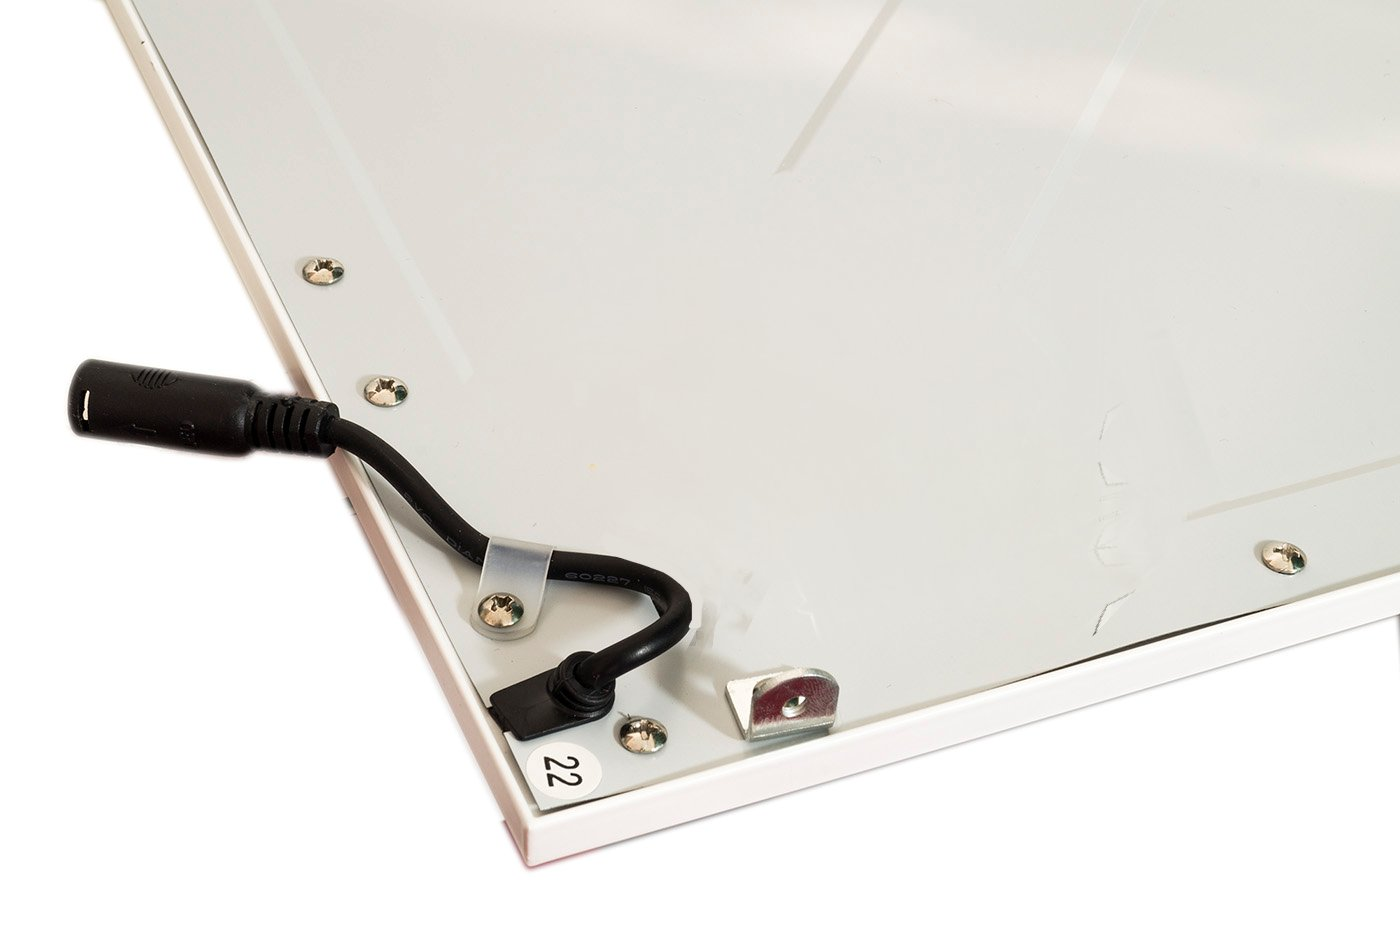 Plafoniera Incasso Led 60x60 : Bes 19510 pannelli kodak beselettronica pannello led 60x60